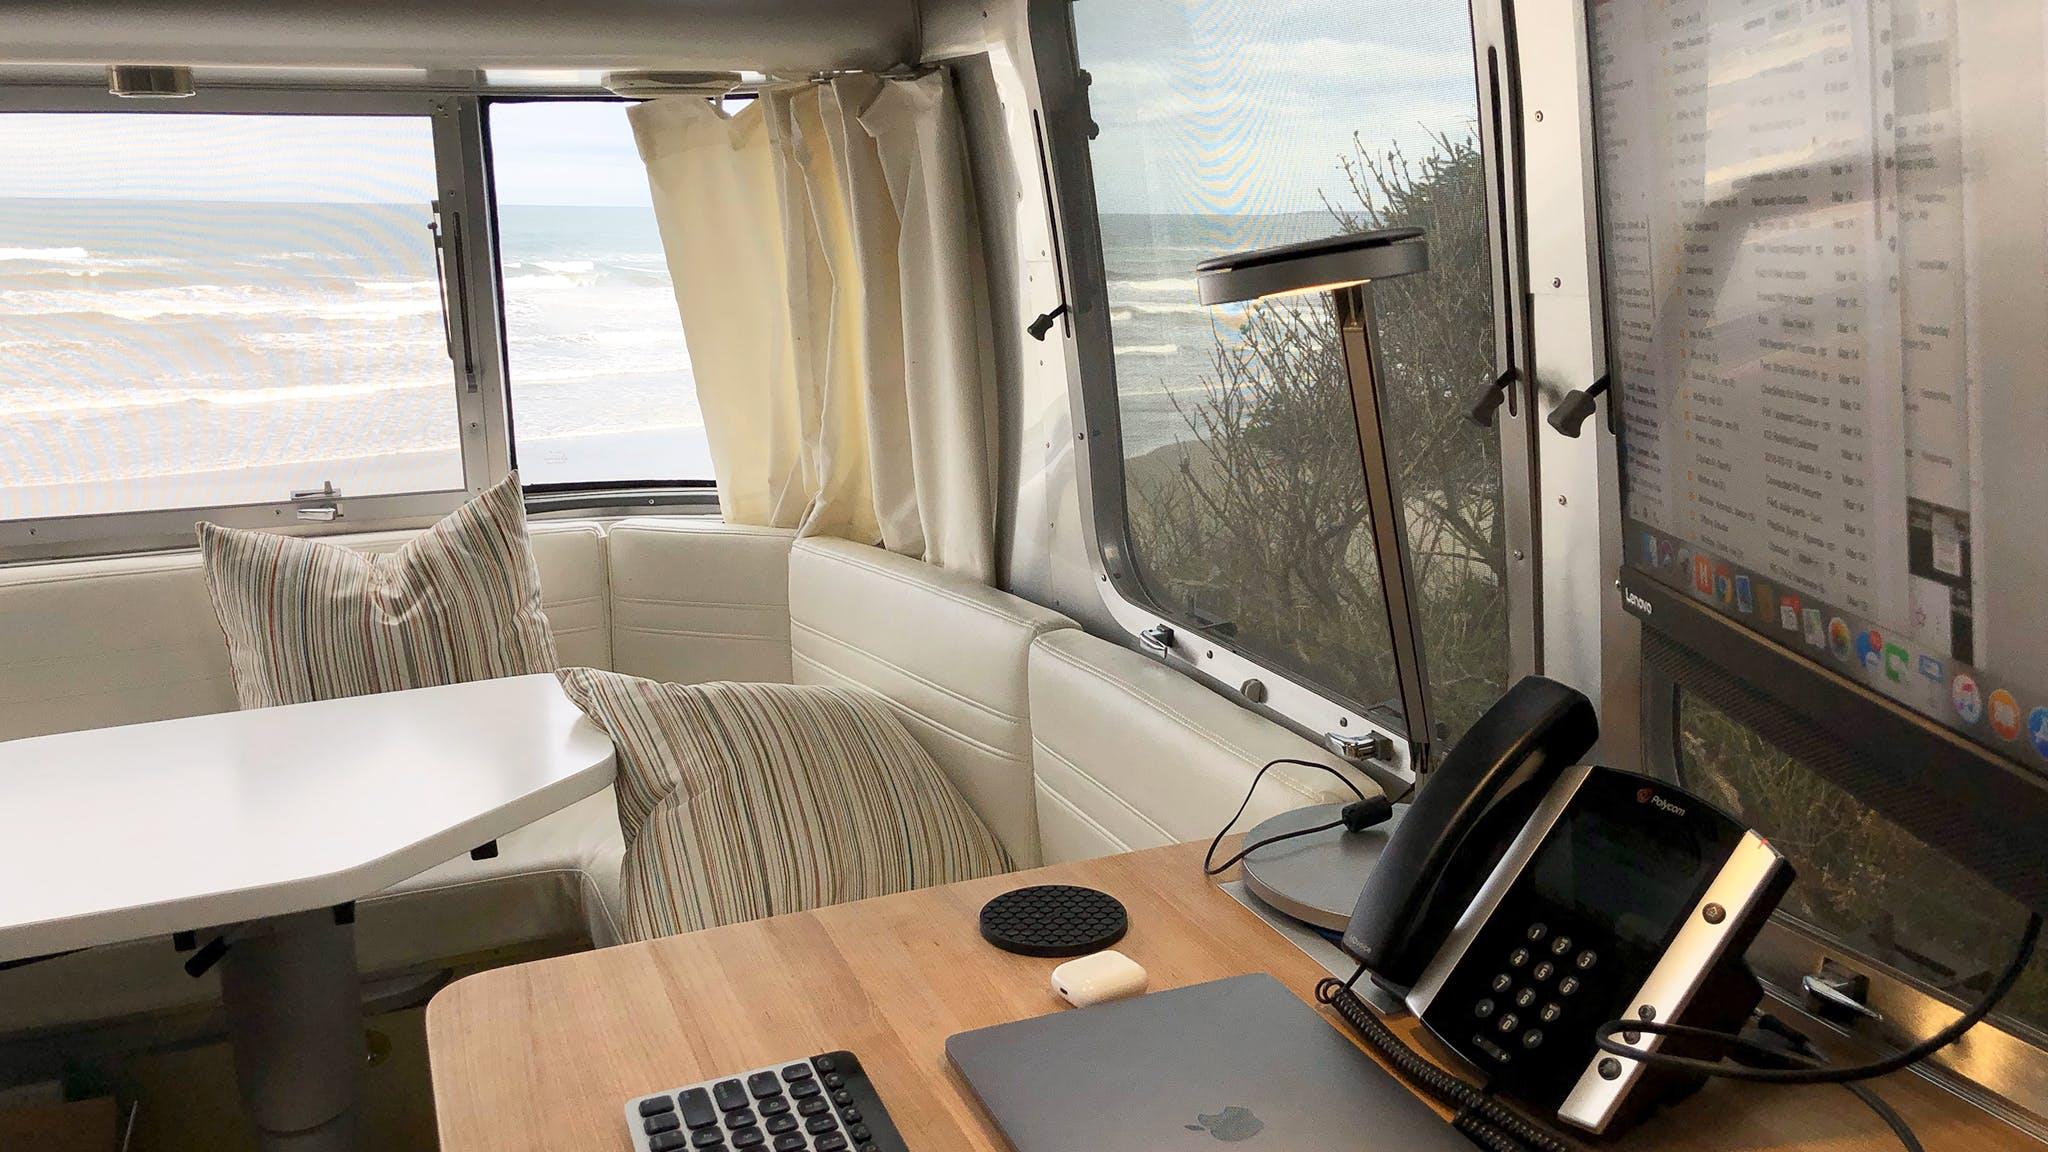 airstream-ambassador-tips-for-working-remotely-blog-header